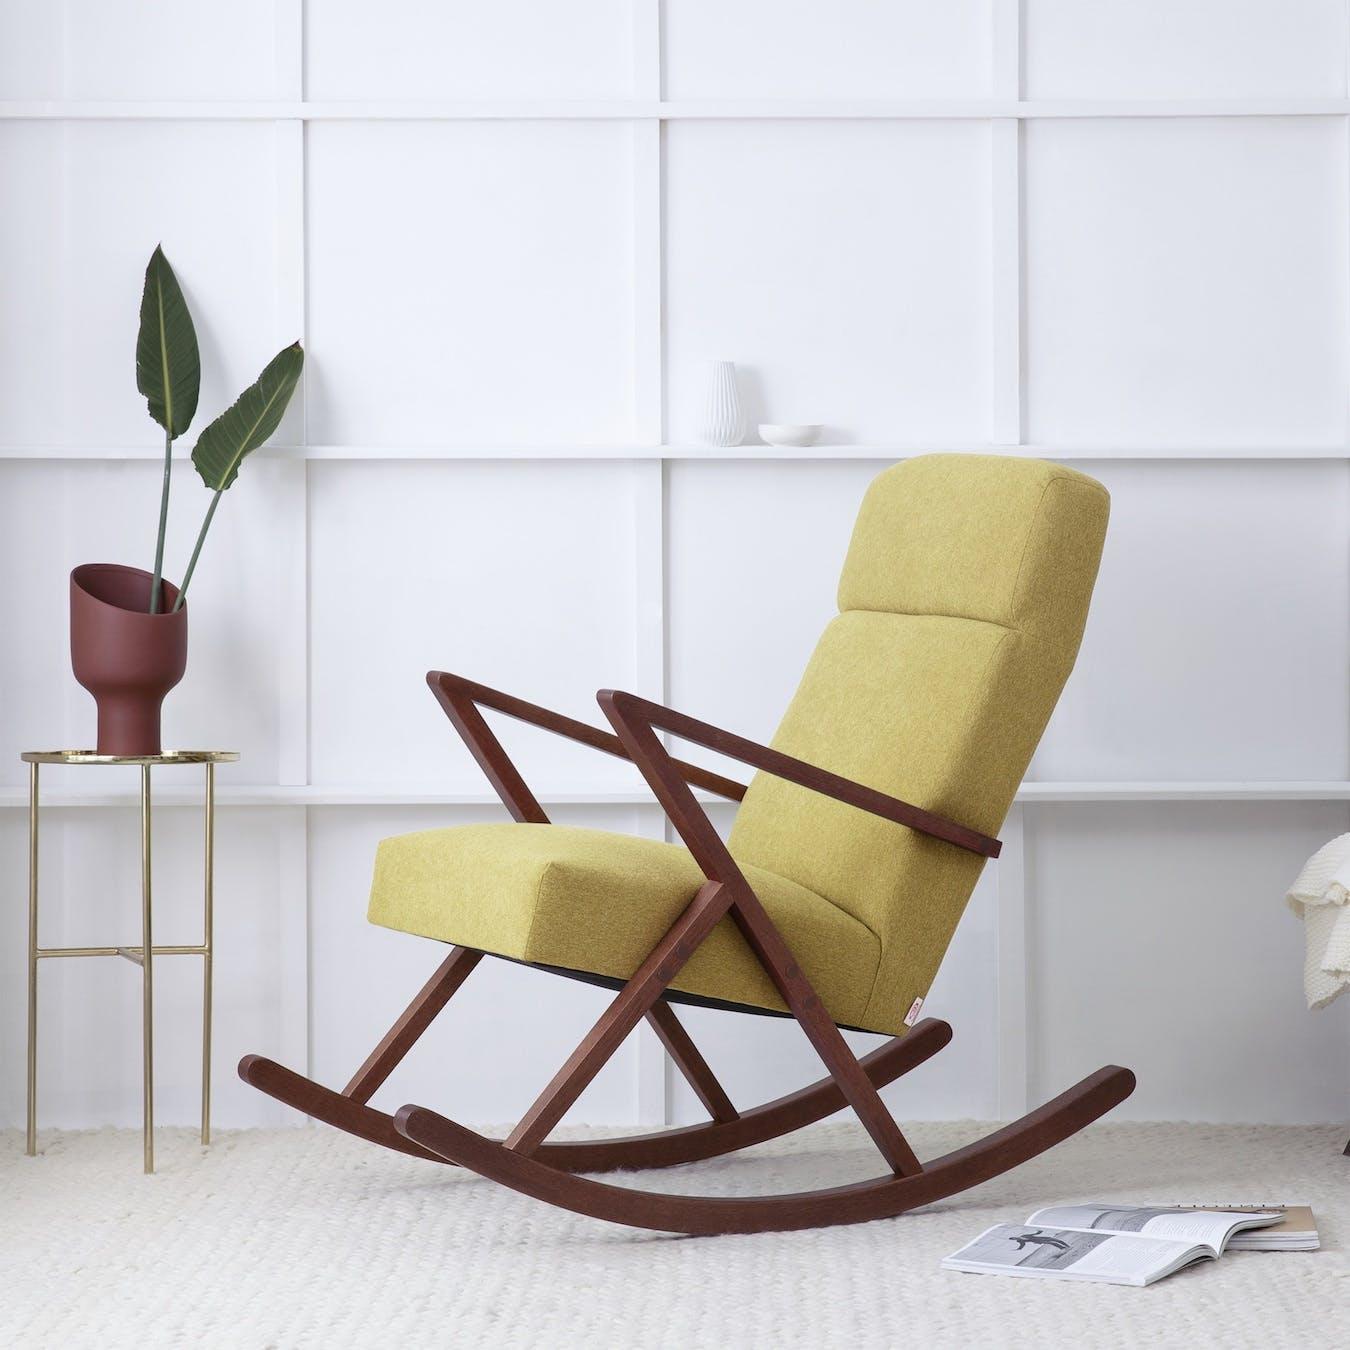 Retrostar Lounge Rocker - Basic-Line in Yellow